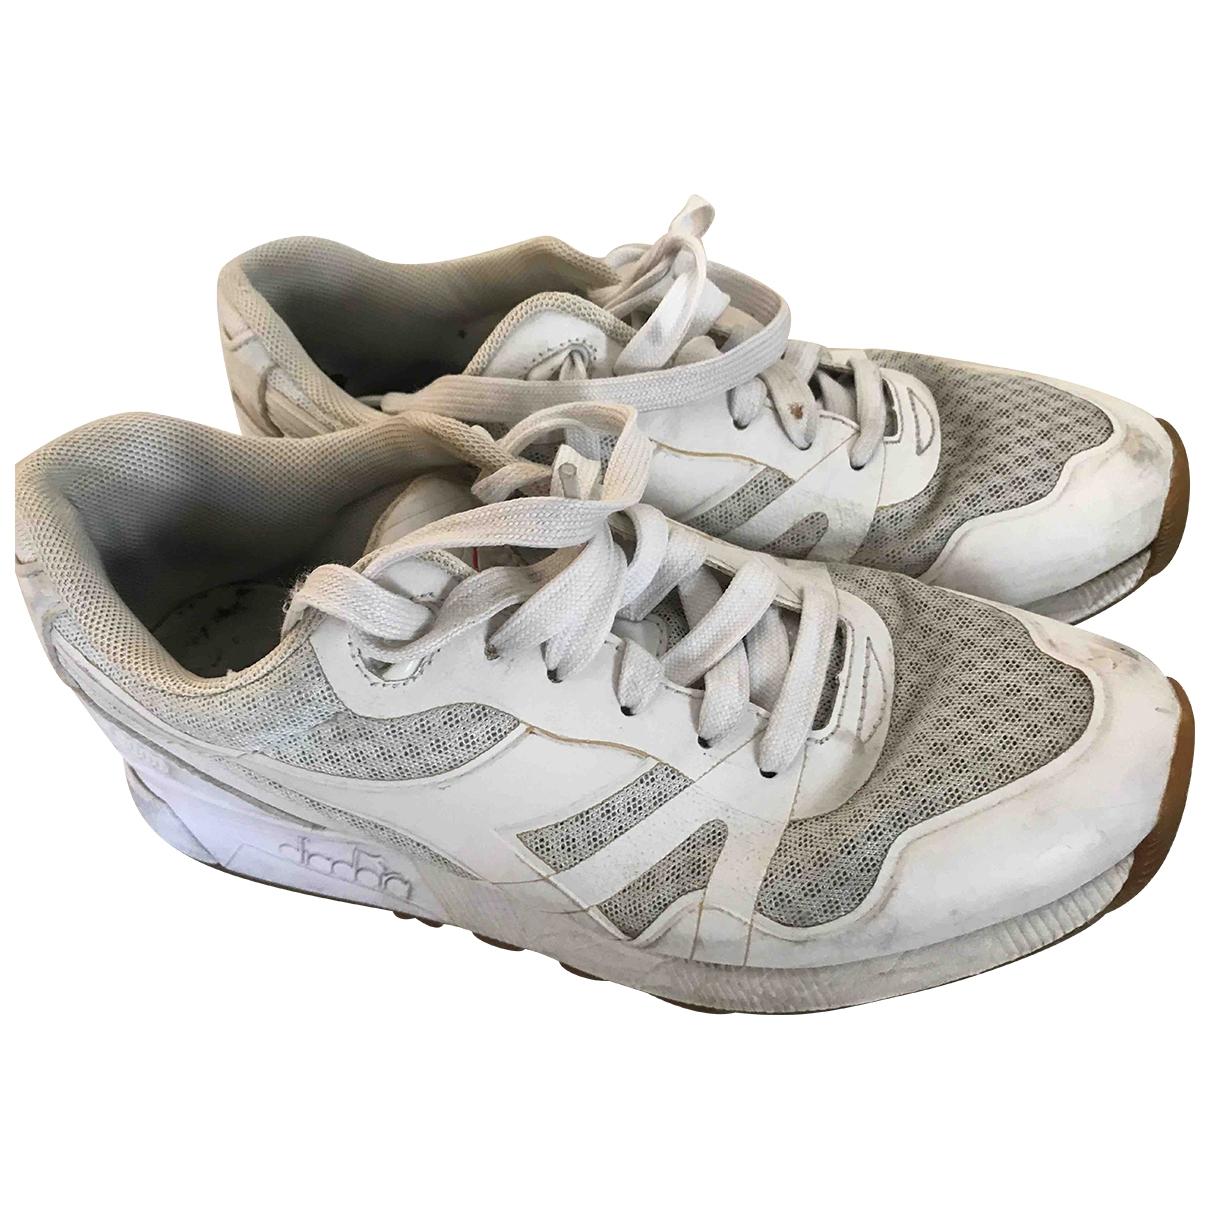 Diadora \N Sneakers in  Weiss Kautschuk